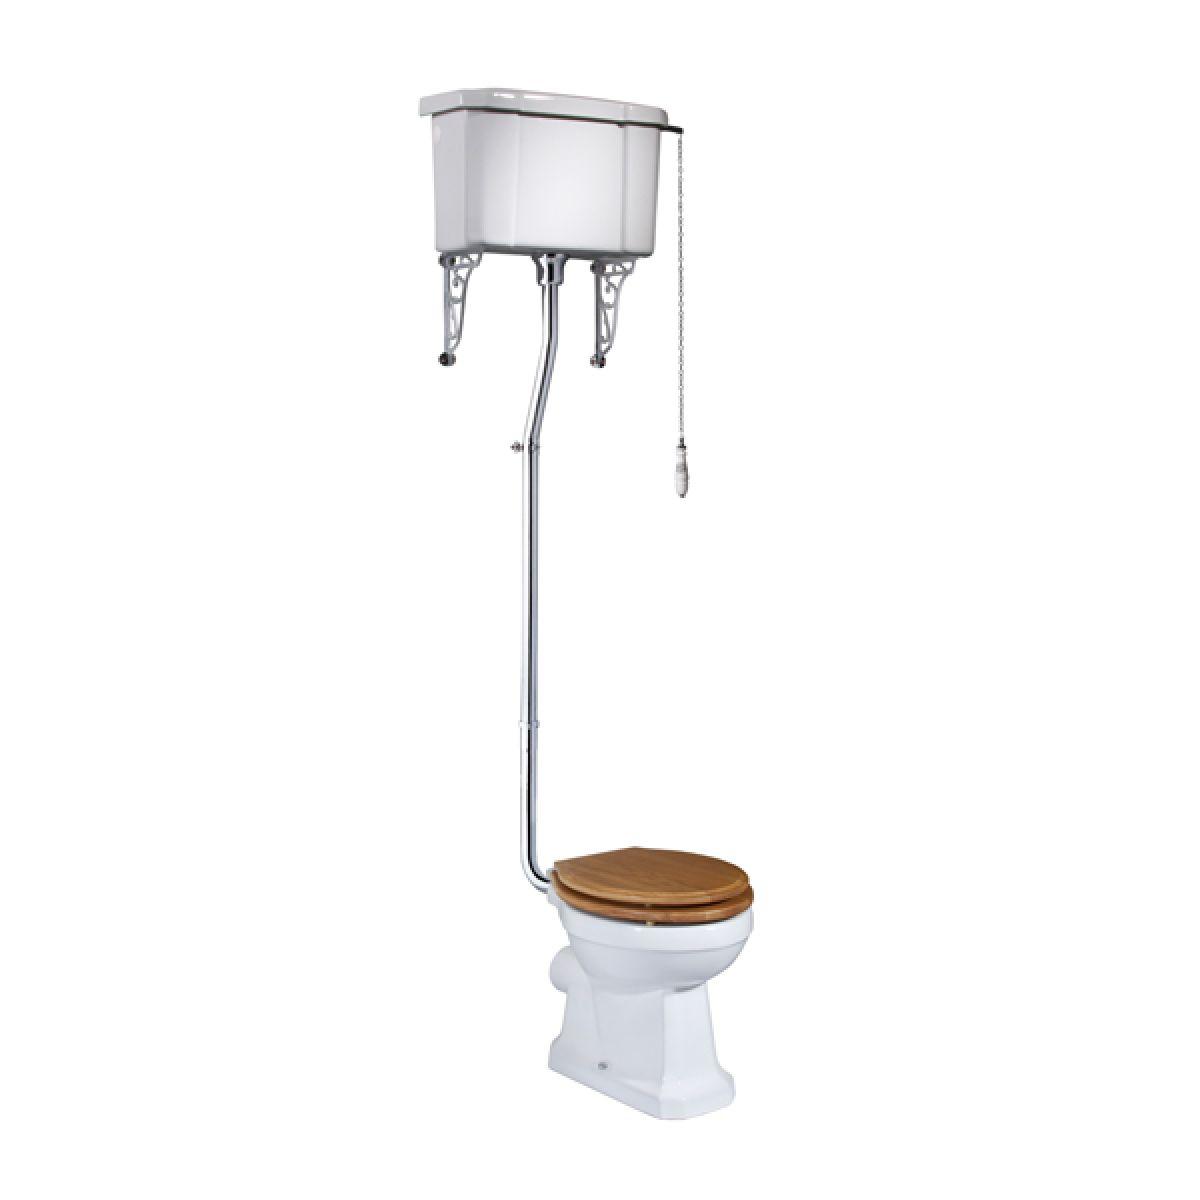 Tavistock Vitoria High Level Toilet - Natural Oak Seat